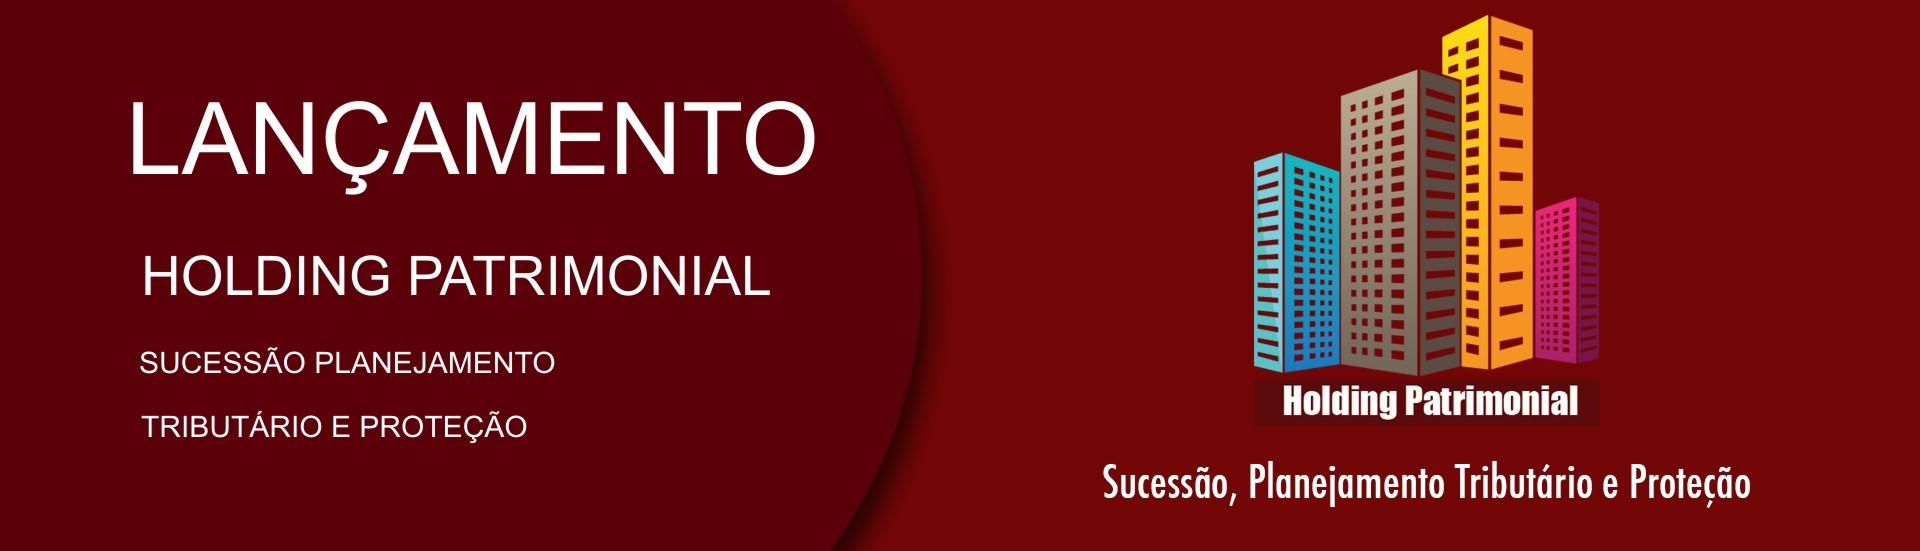 Curso Online de Holding Familiar e Prote��o Patrimonial